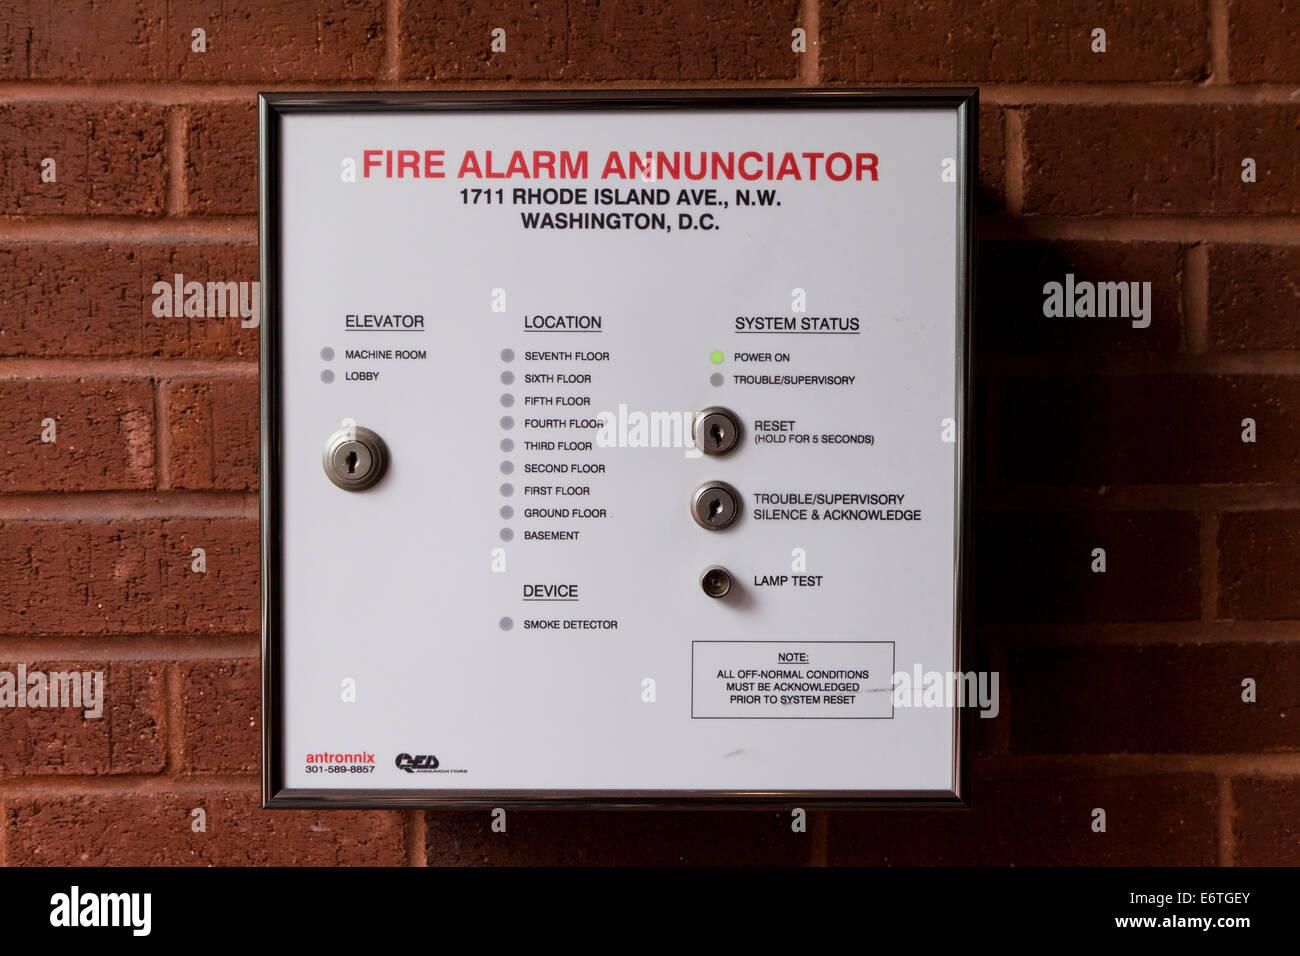 Commercial Building Fire Alarm Annunciator